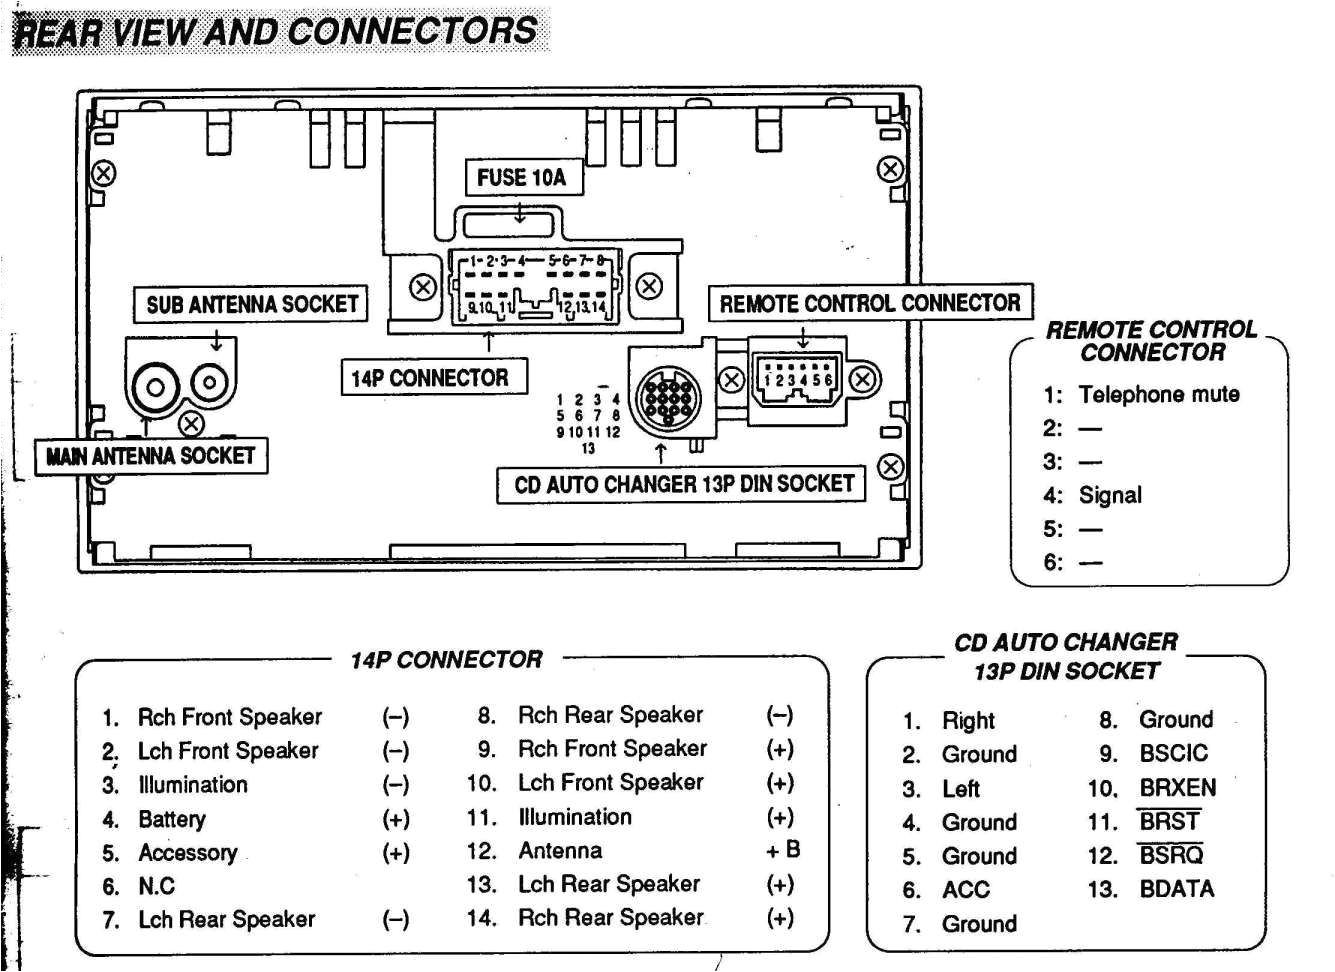 2006 Scion Xb Stereo Wiring Diagram Mitsubishi Car Radio Wiring Diagram Blog Wiring Diagram